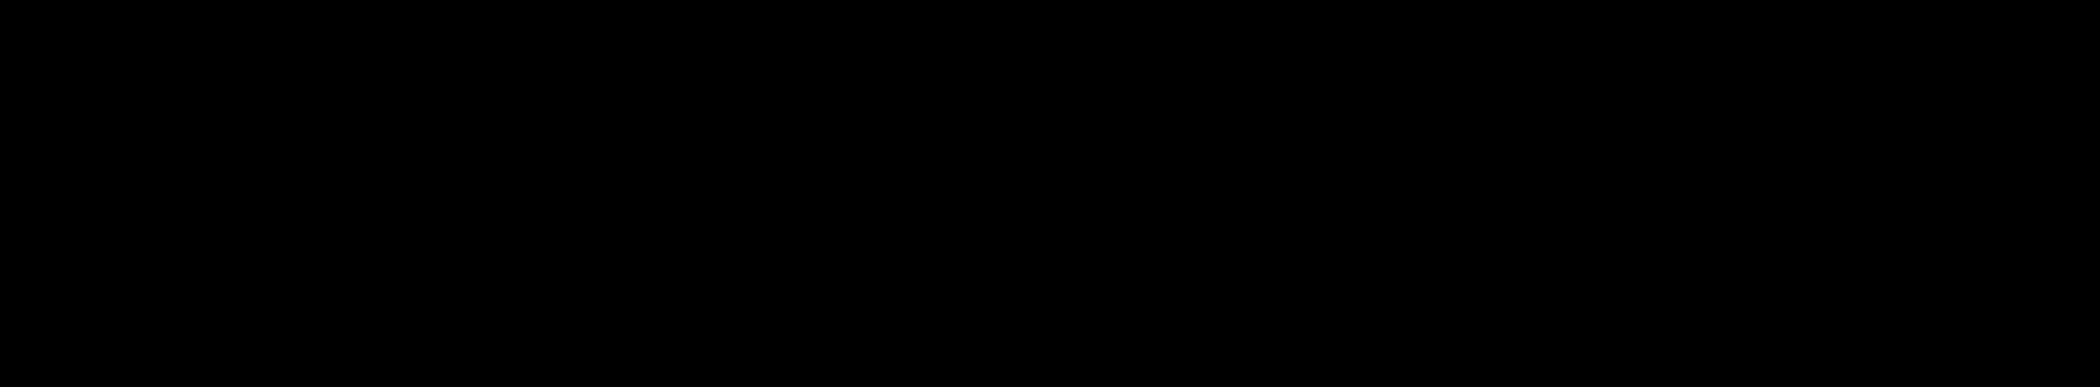 call of duty logo 1 - Call of Duty Logo